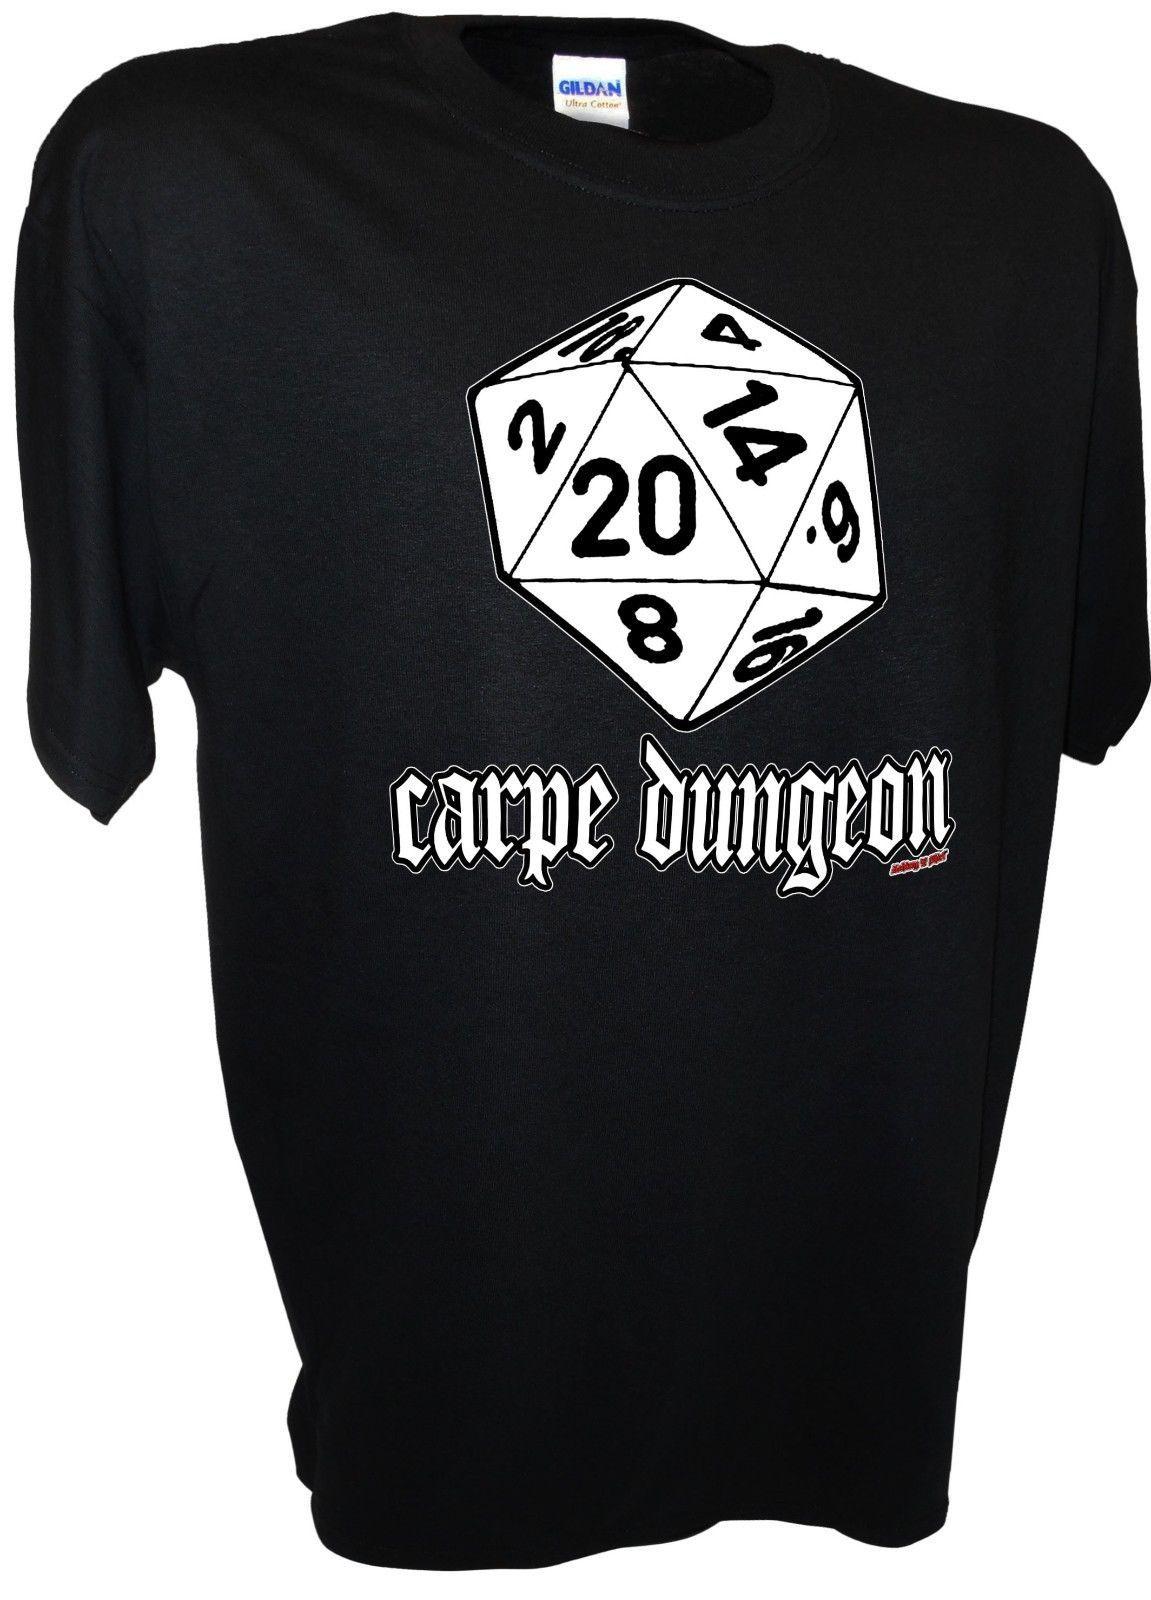 49552d638 Carpe Dungeon D20 Wargaming Dragons Fantasy Gaming MMORPG 20 Side Dice RPG  Tee Summer Hot Sale Men T Shirt Top New Tee Print Cloth T Shirt Shirt Site  From ...